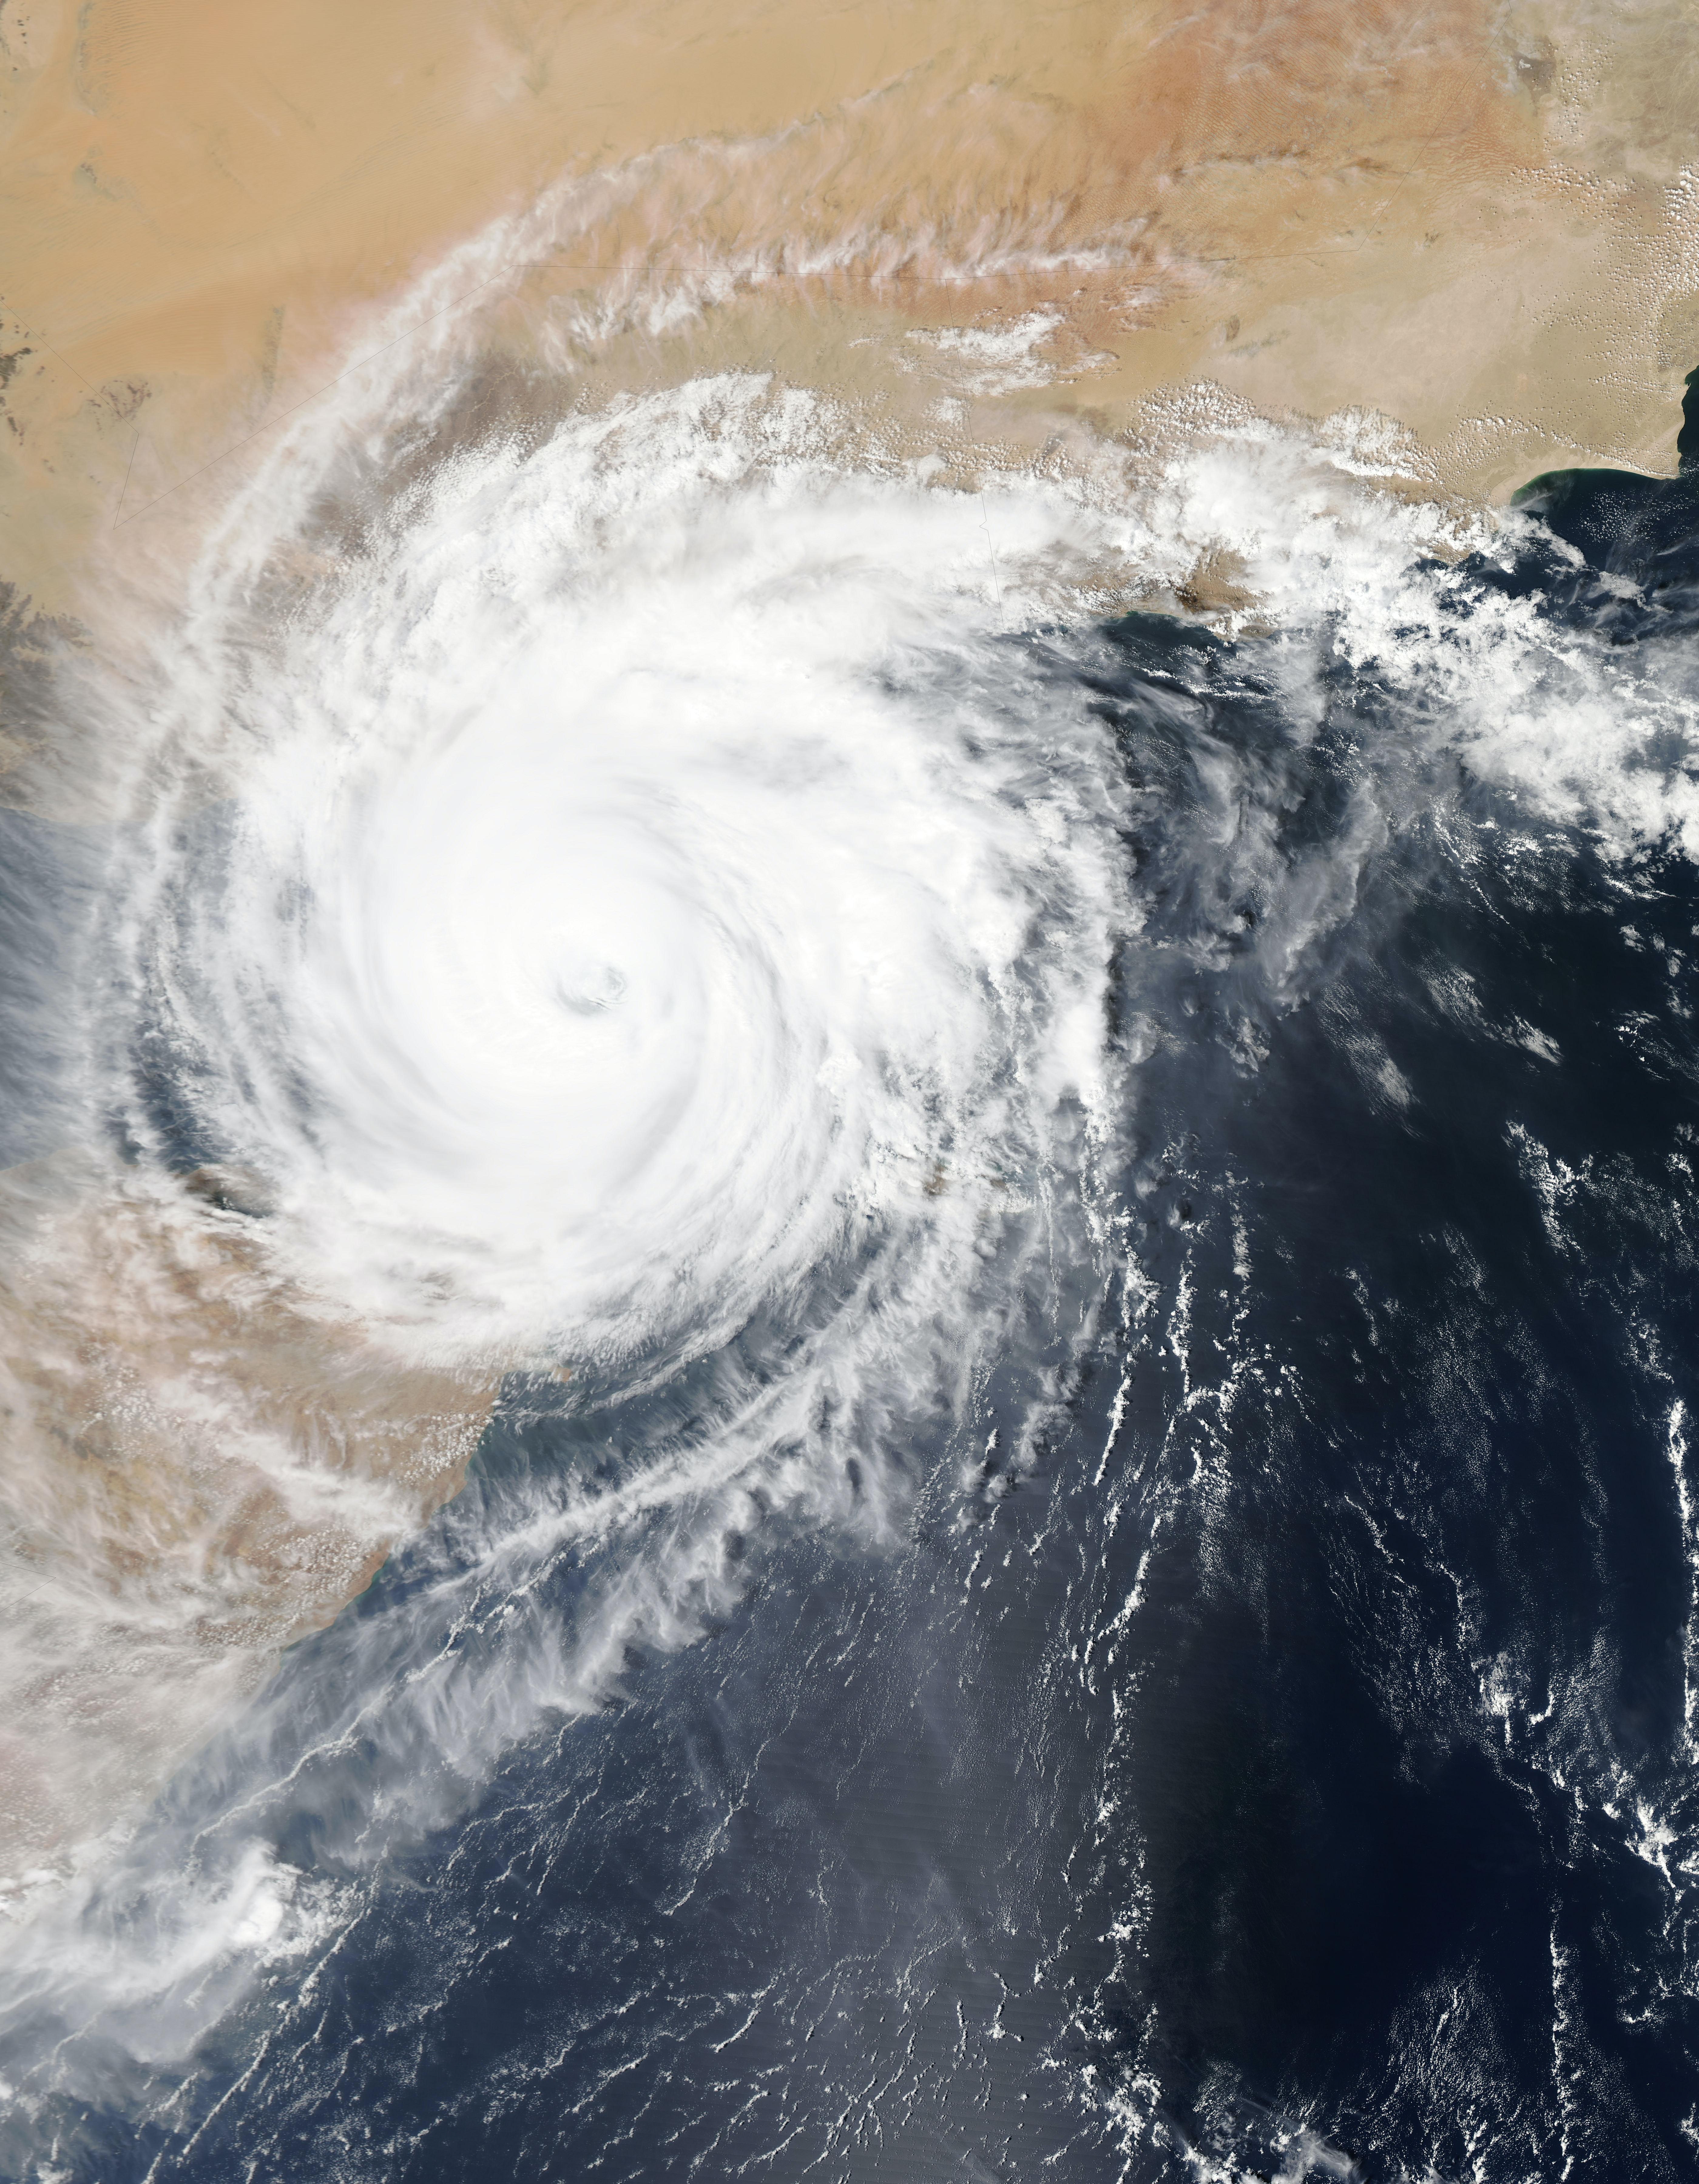 Can Big Data Help Avert Catastrophes?